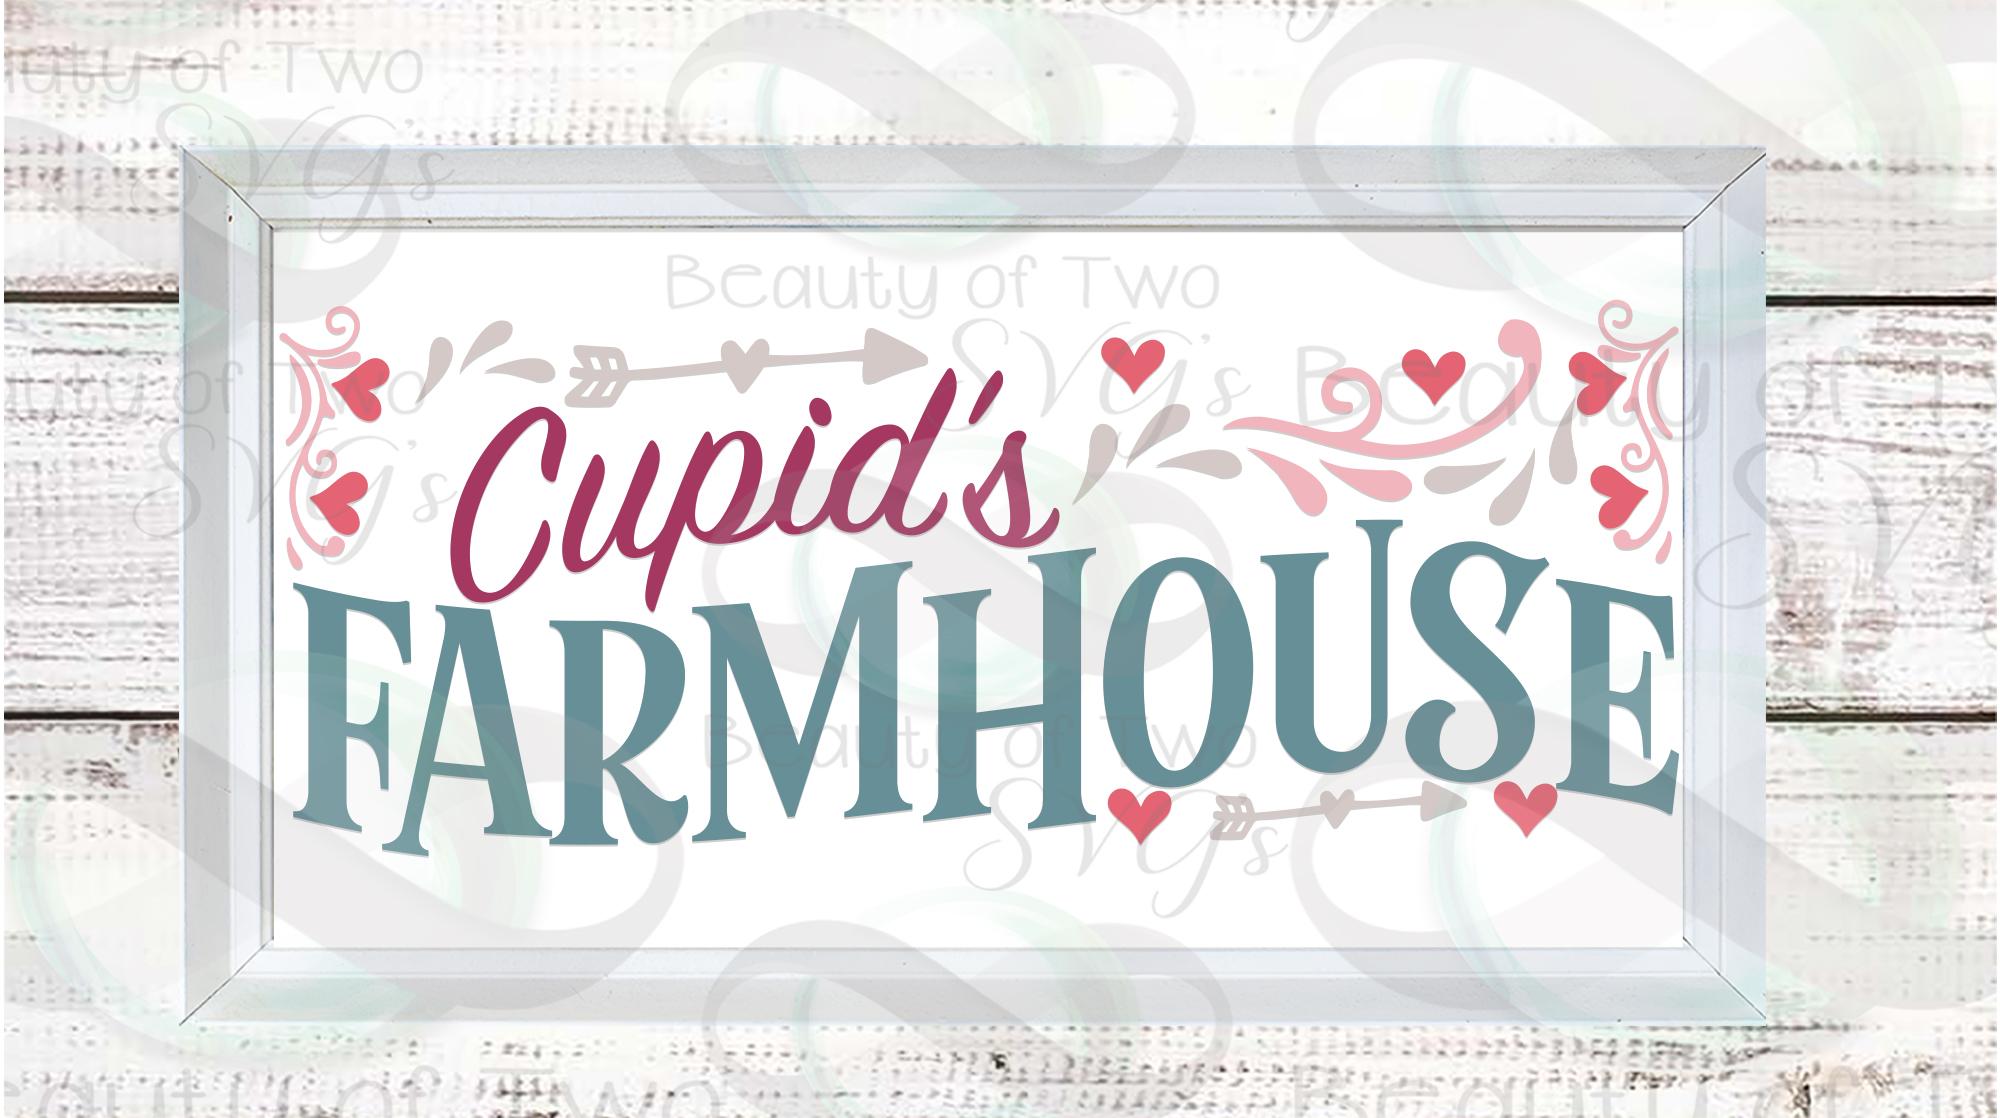 Farmhouse Valentines Svg Sign Bundle, 6 Valentine svgs example image 6